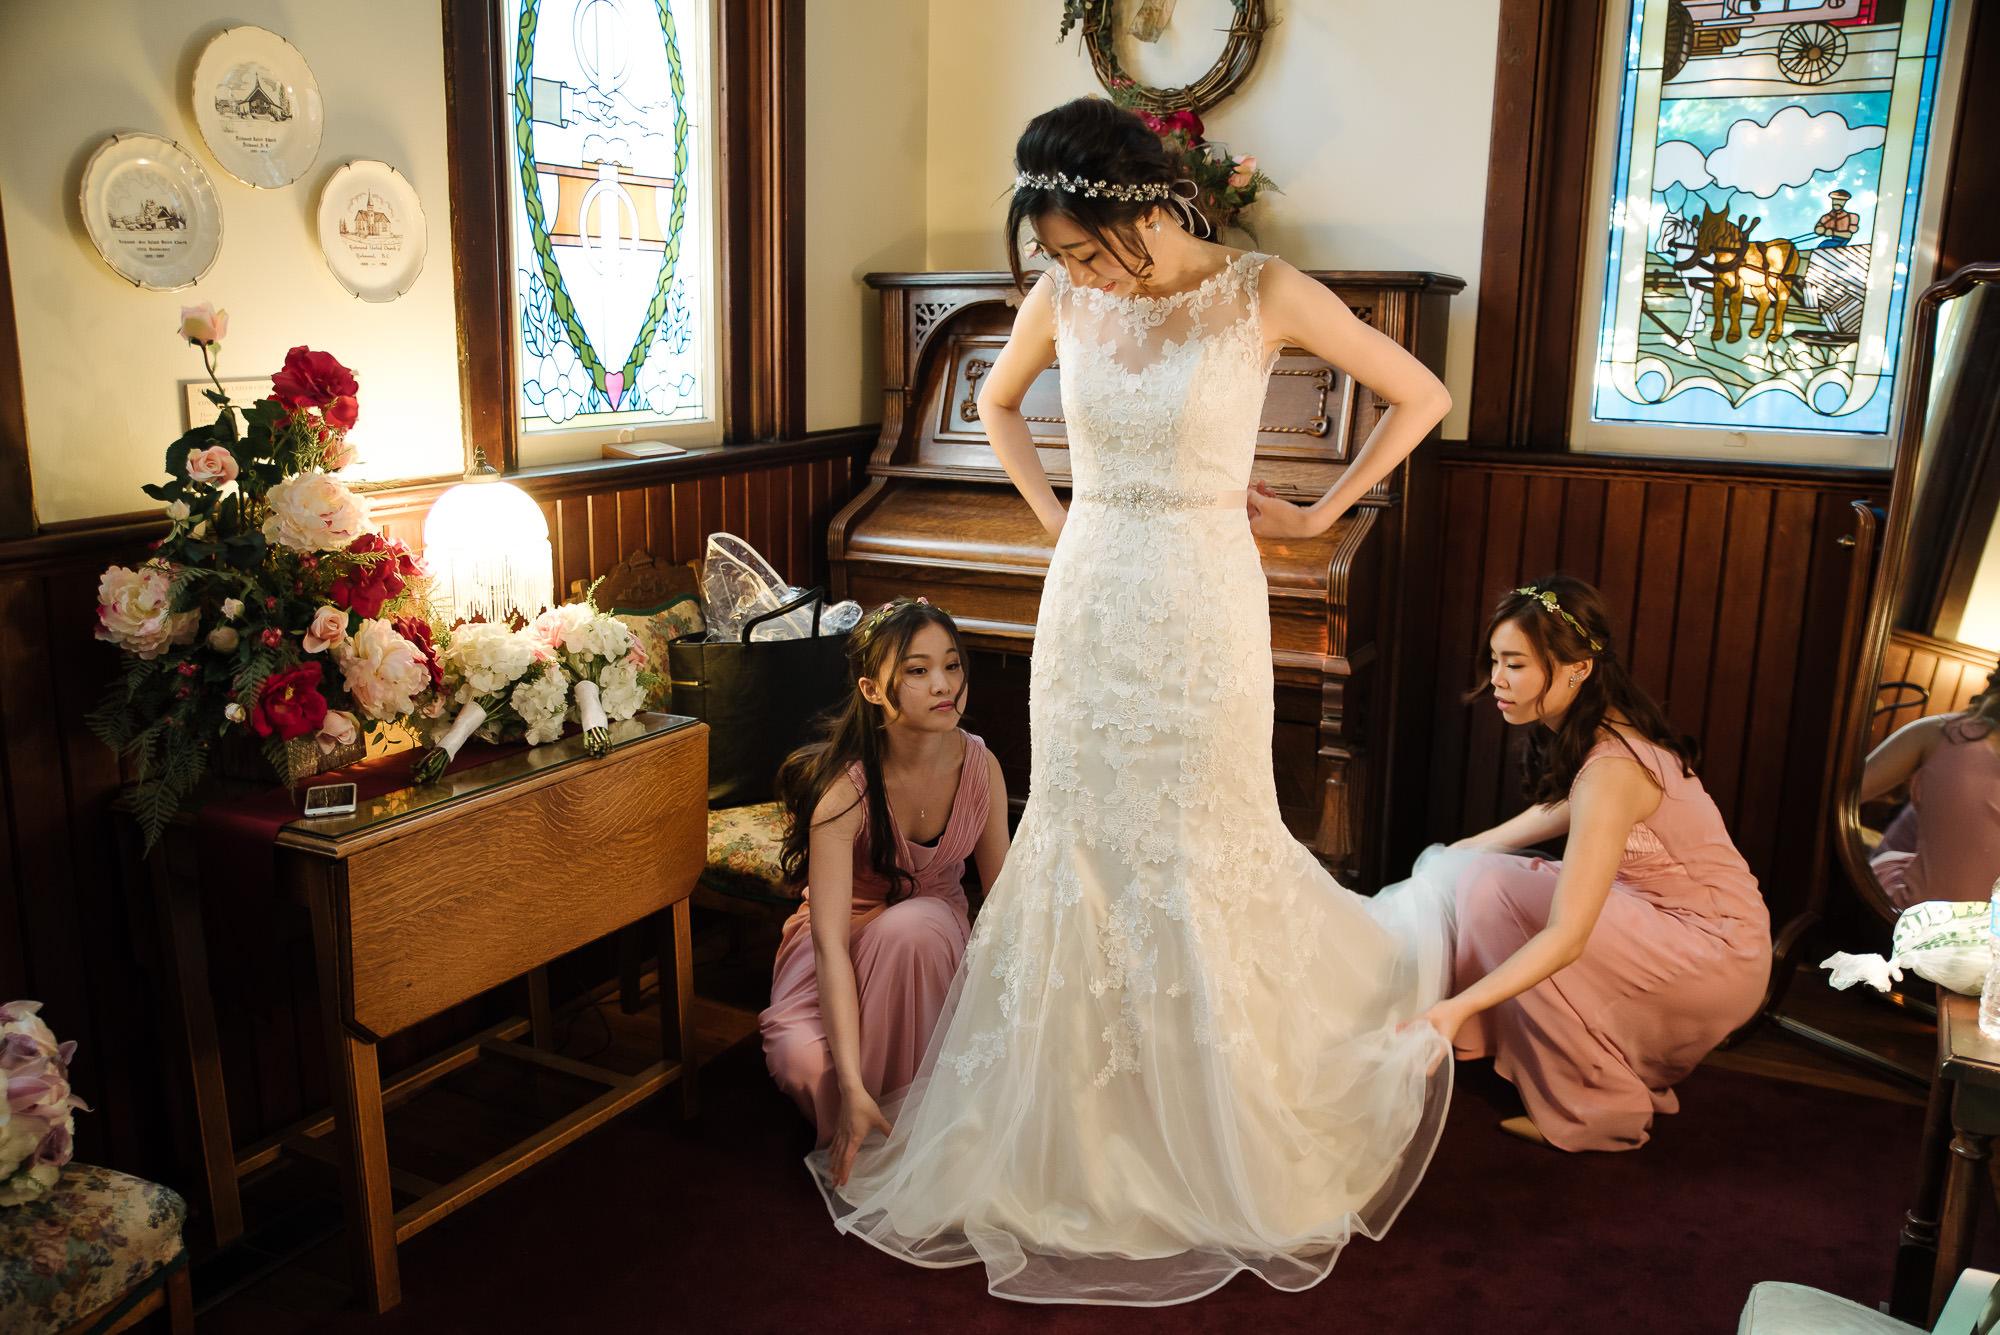 minoru_chapel_richmond_wedding_preparation 1519311.jpg